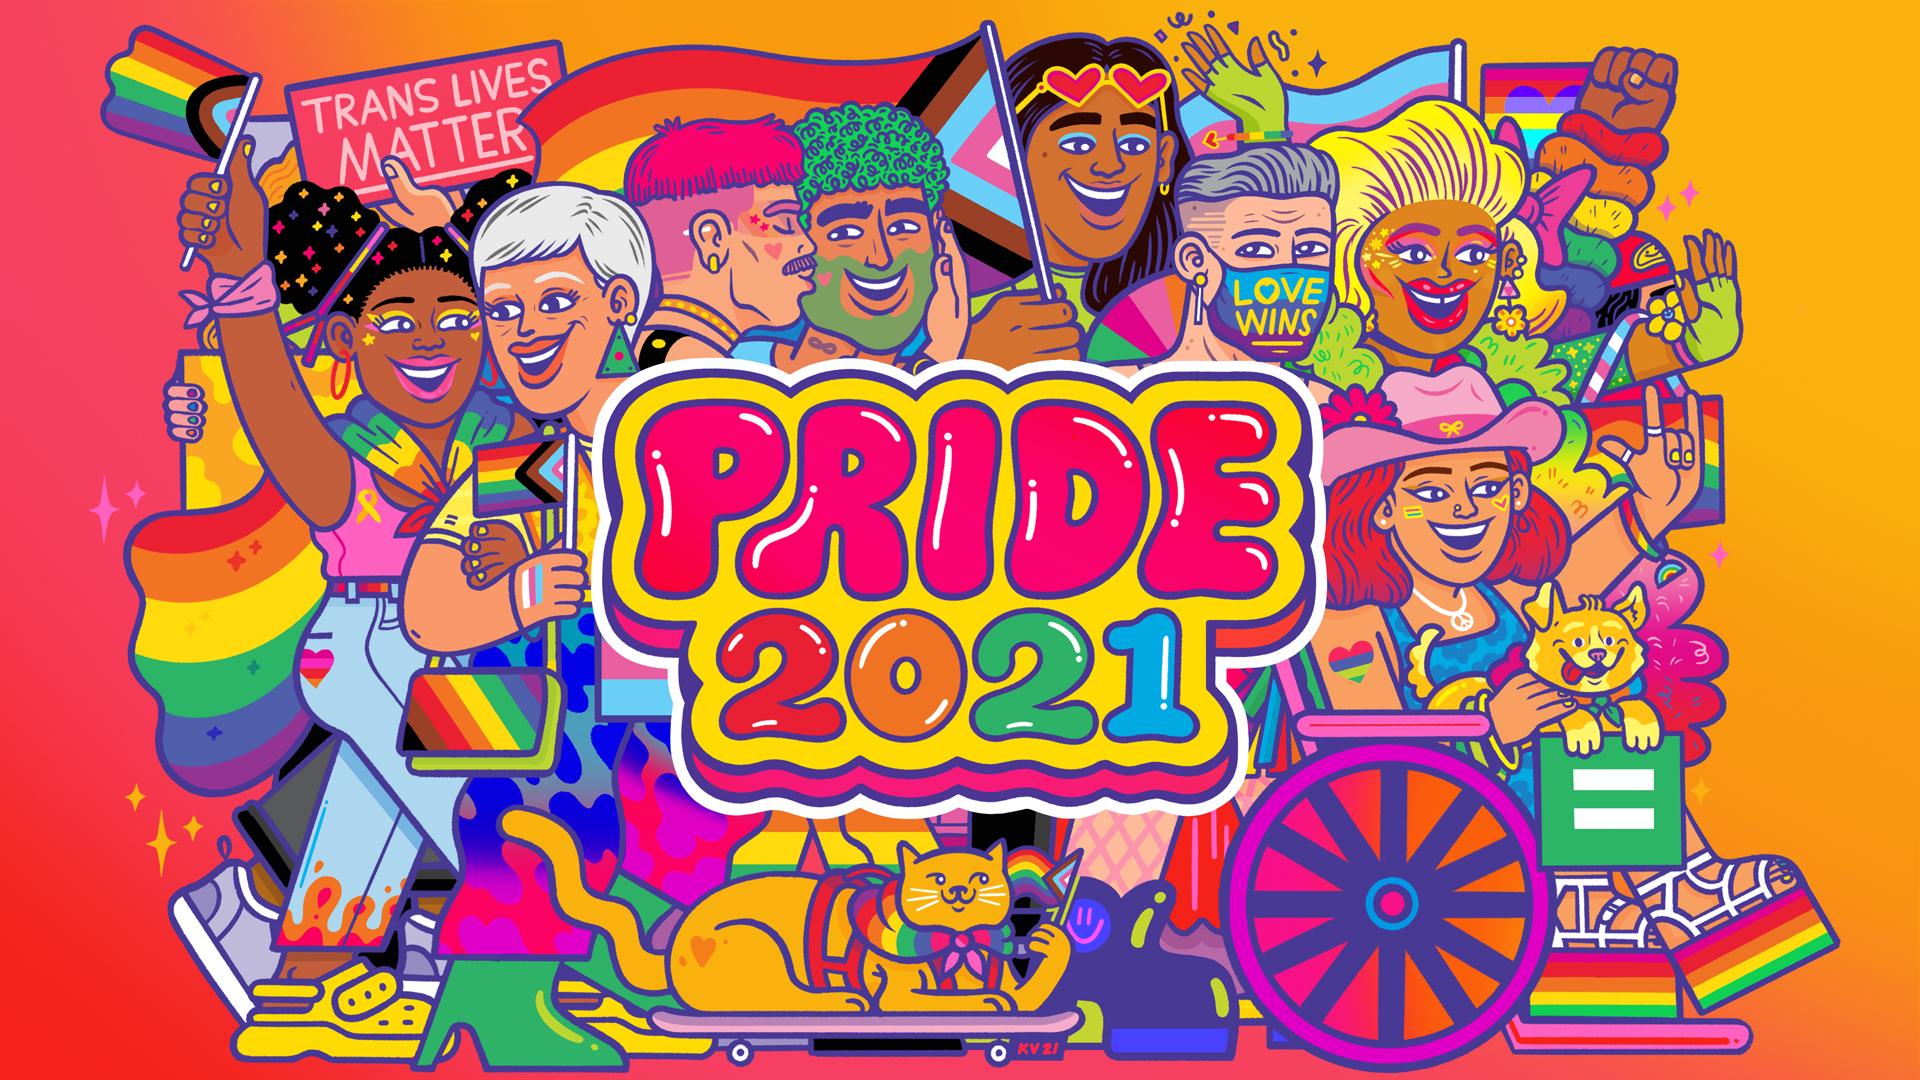 Buzzfeed's 2021 Pride Month rainbow artwork